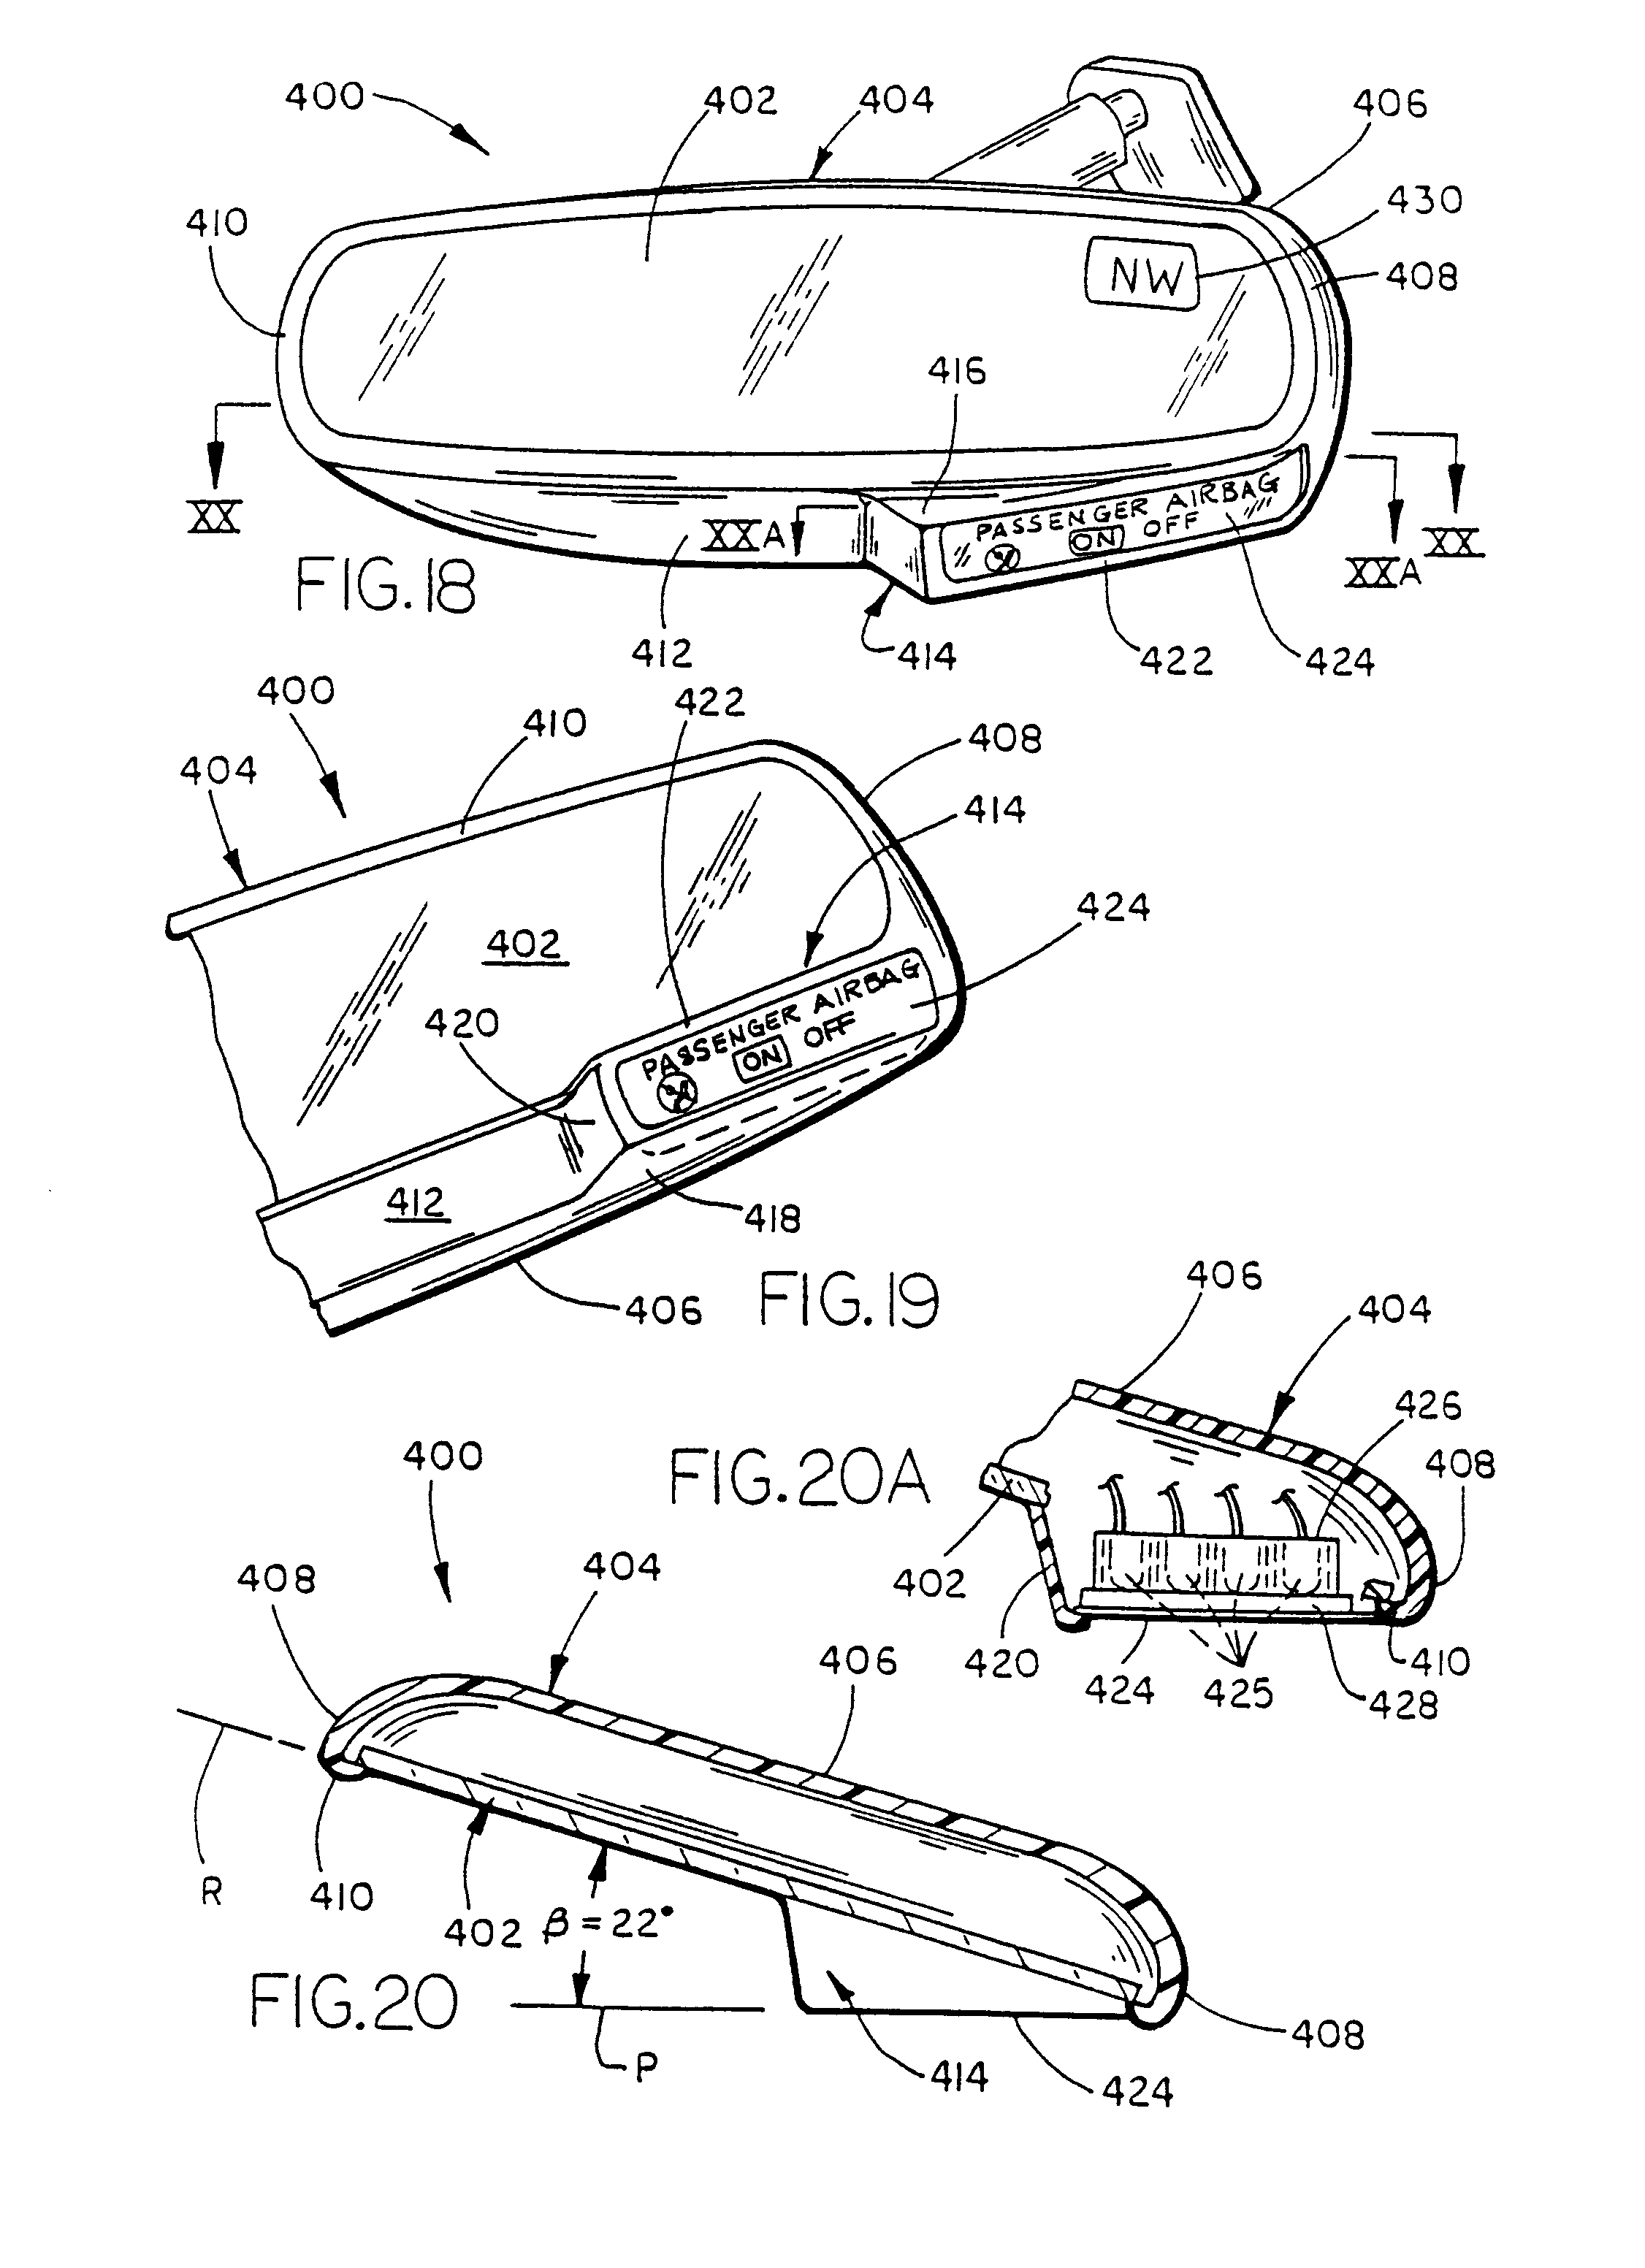 Patent US 8,063,753 B2